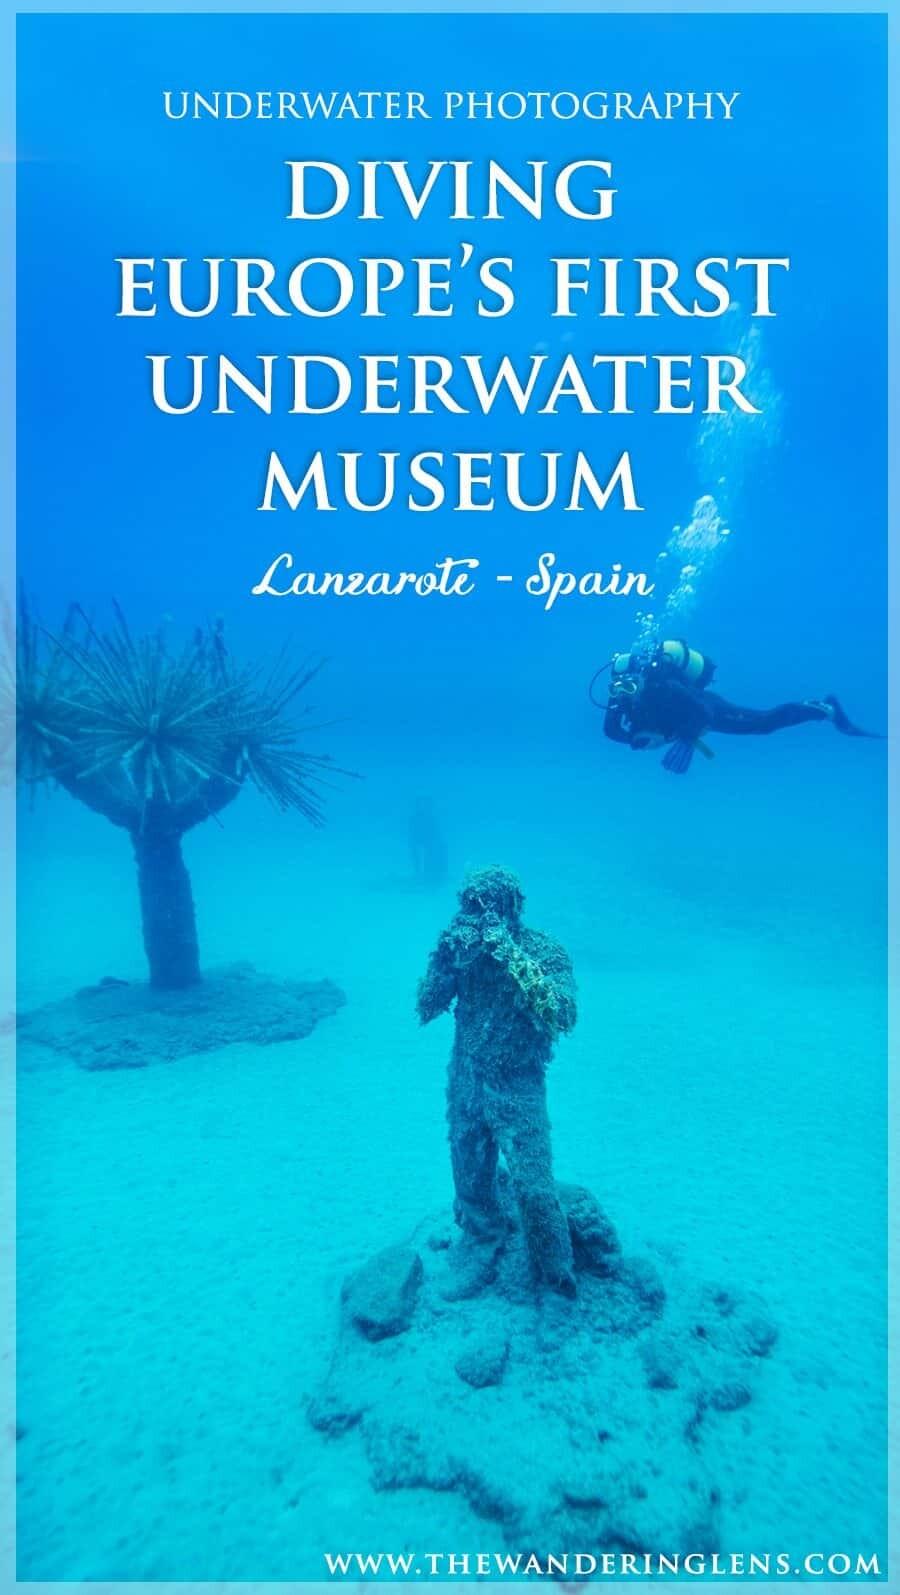 Underwater Museum in Europe, the Museo Atlantico off the coast of Lanzarote, Spain